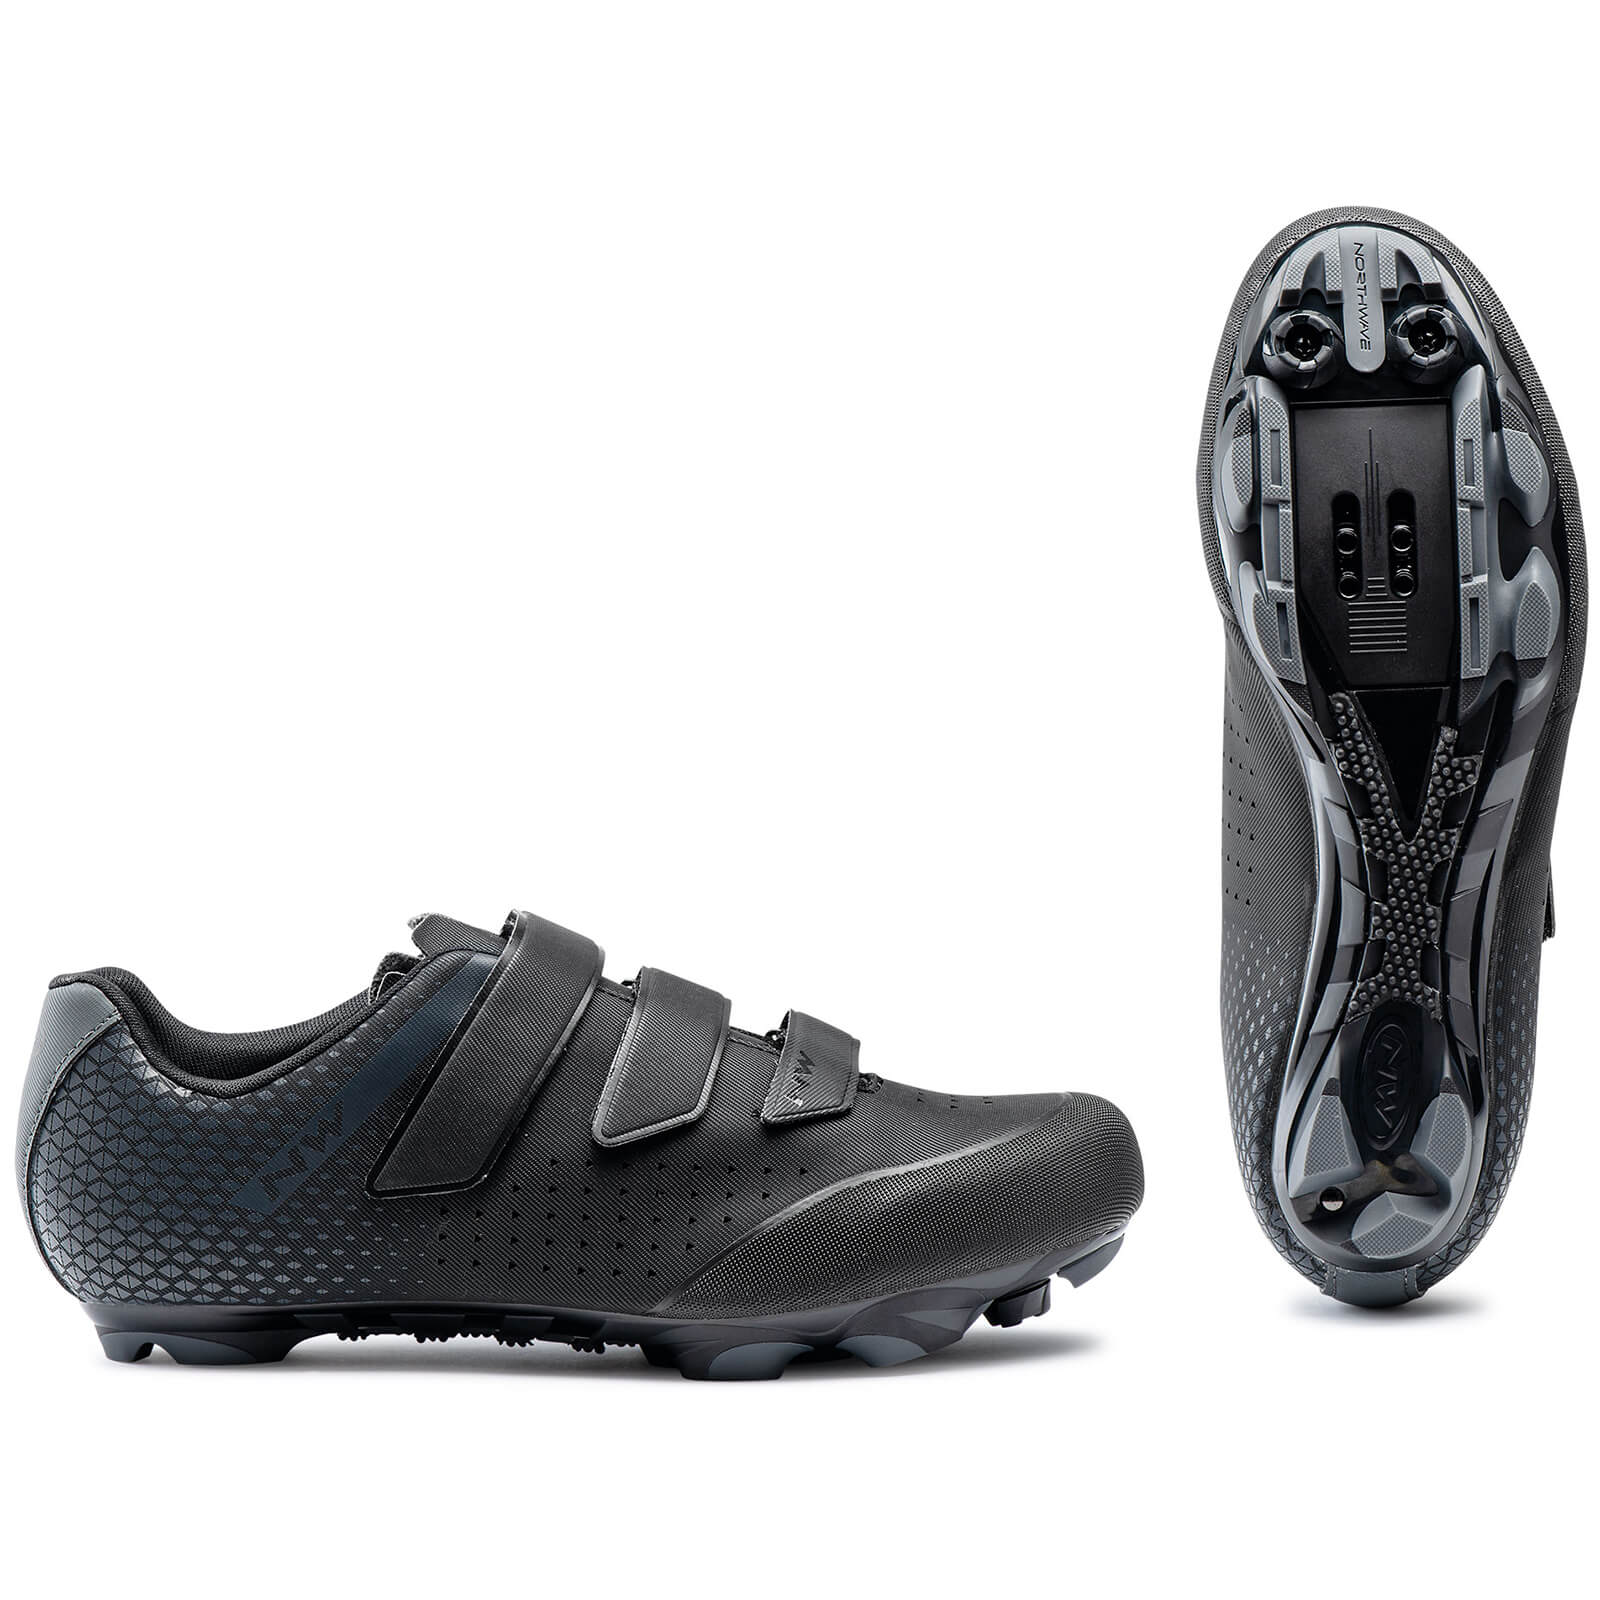 Northwave Origin 2 MTB Shoes - EU43 - Black/Anthra